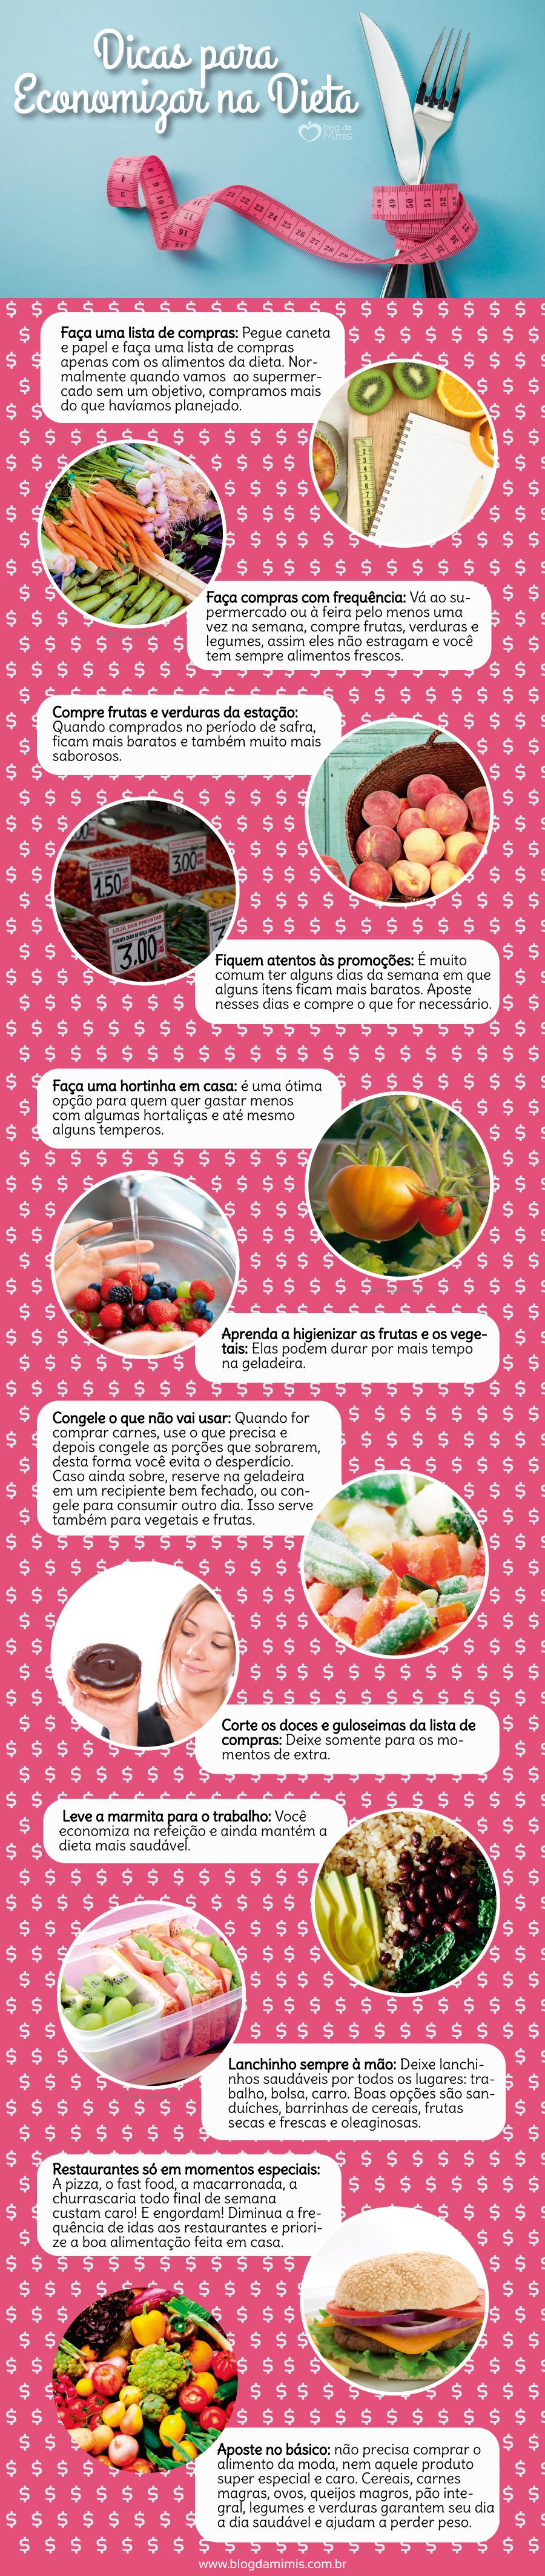 Dicas-para-economizar-na-dieta-blog-da-mimis-michelle-franzoni-post